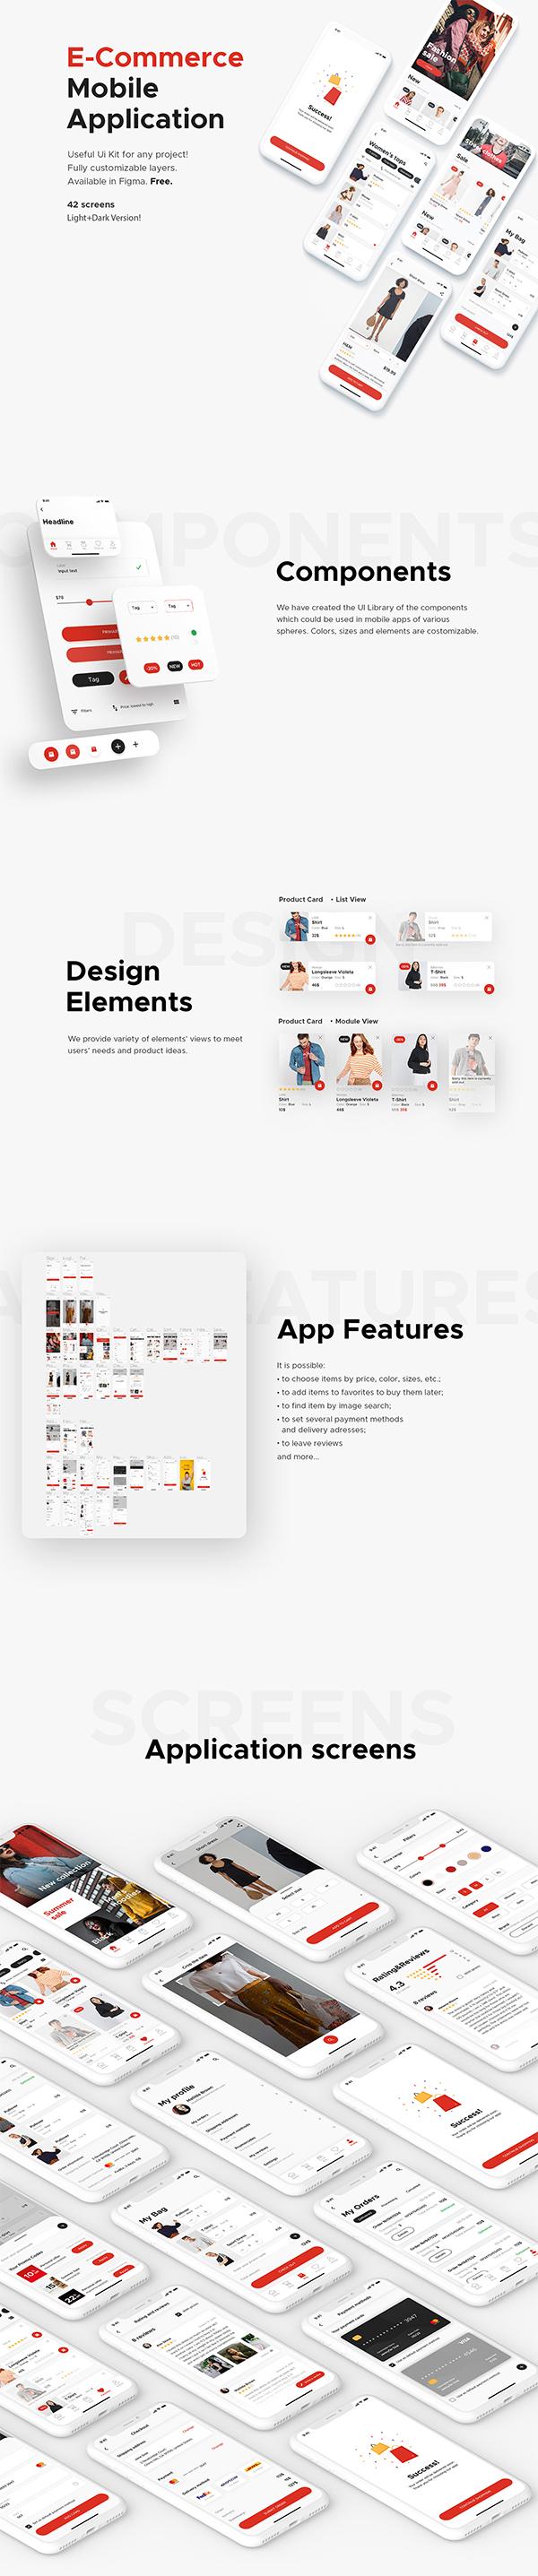 Free | E-Commerce Mobile Application